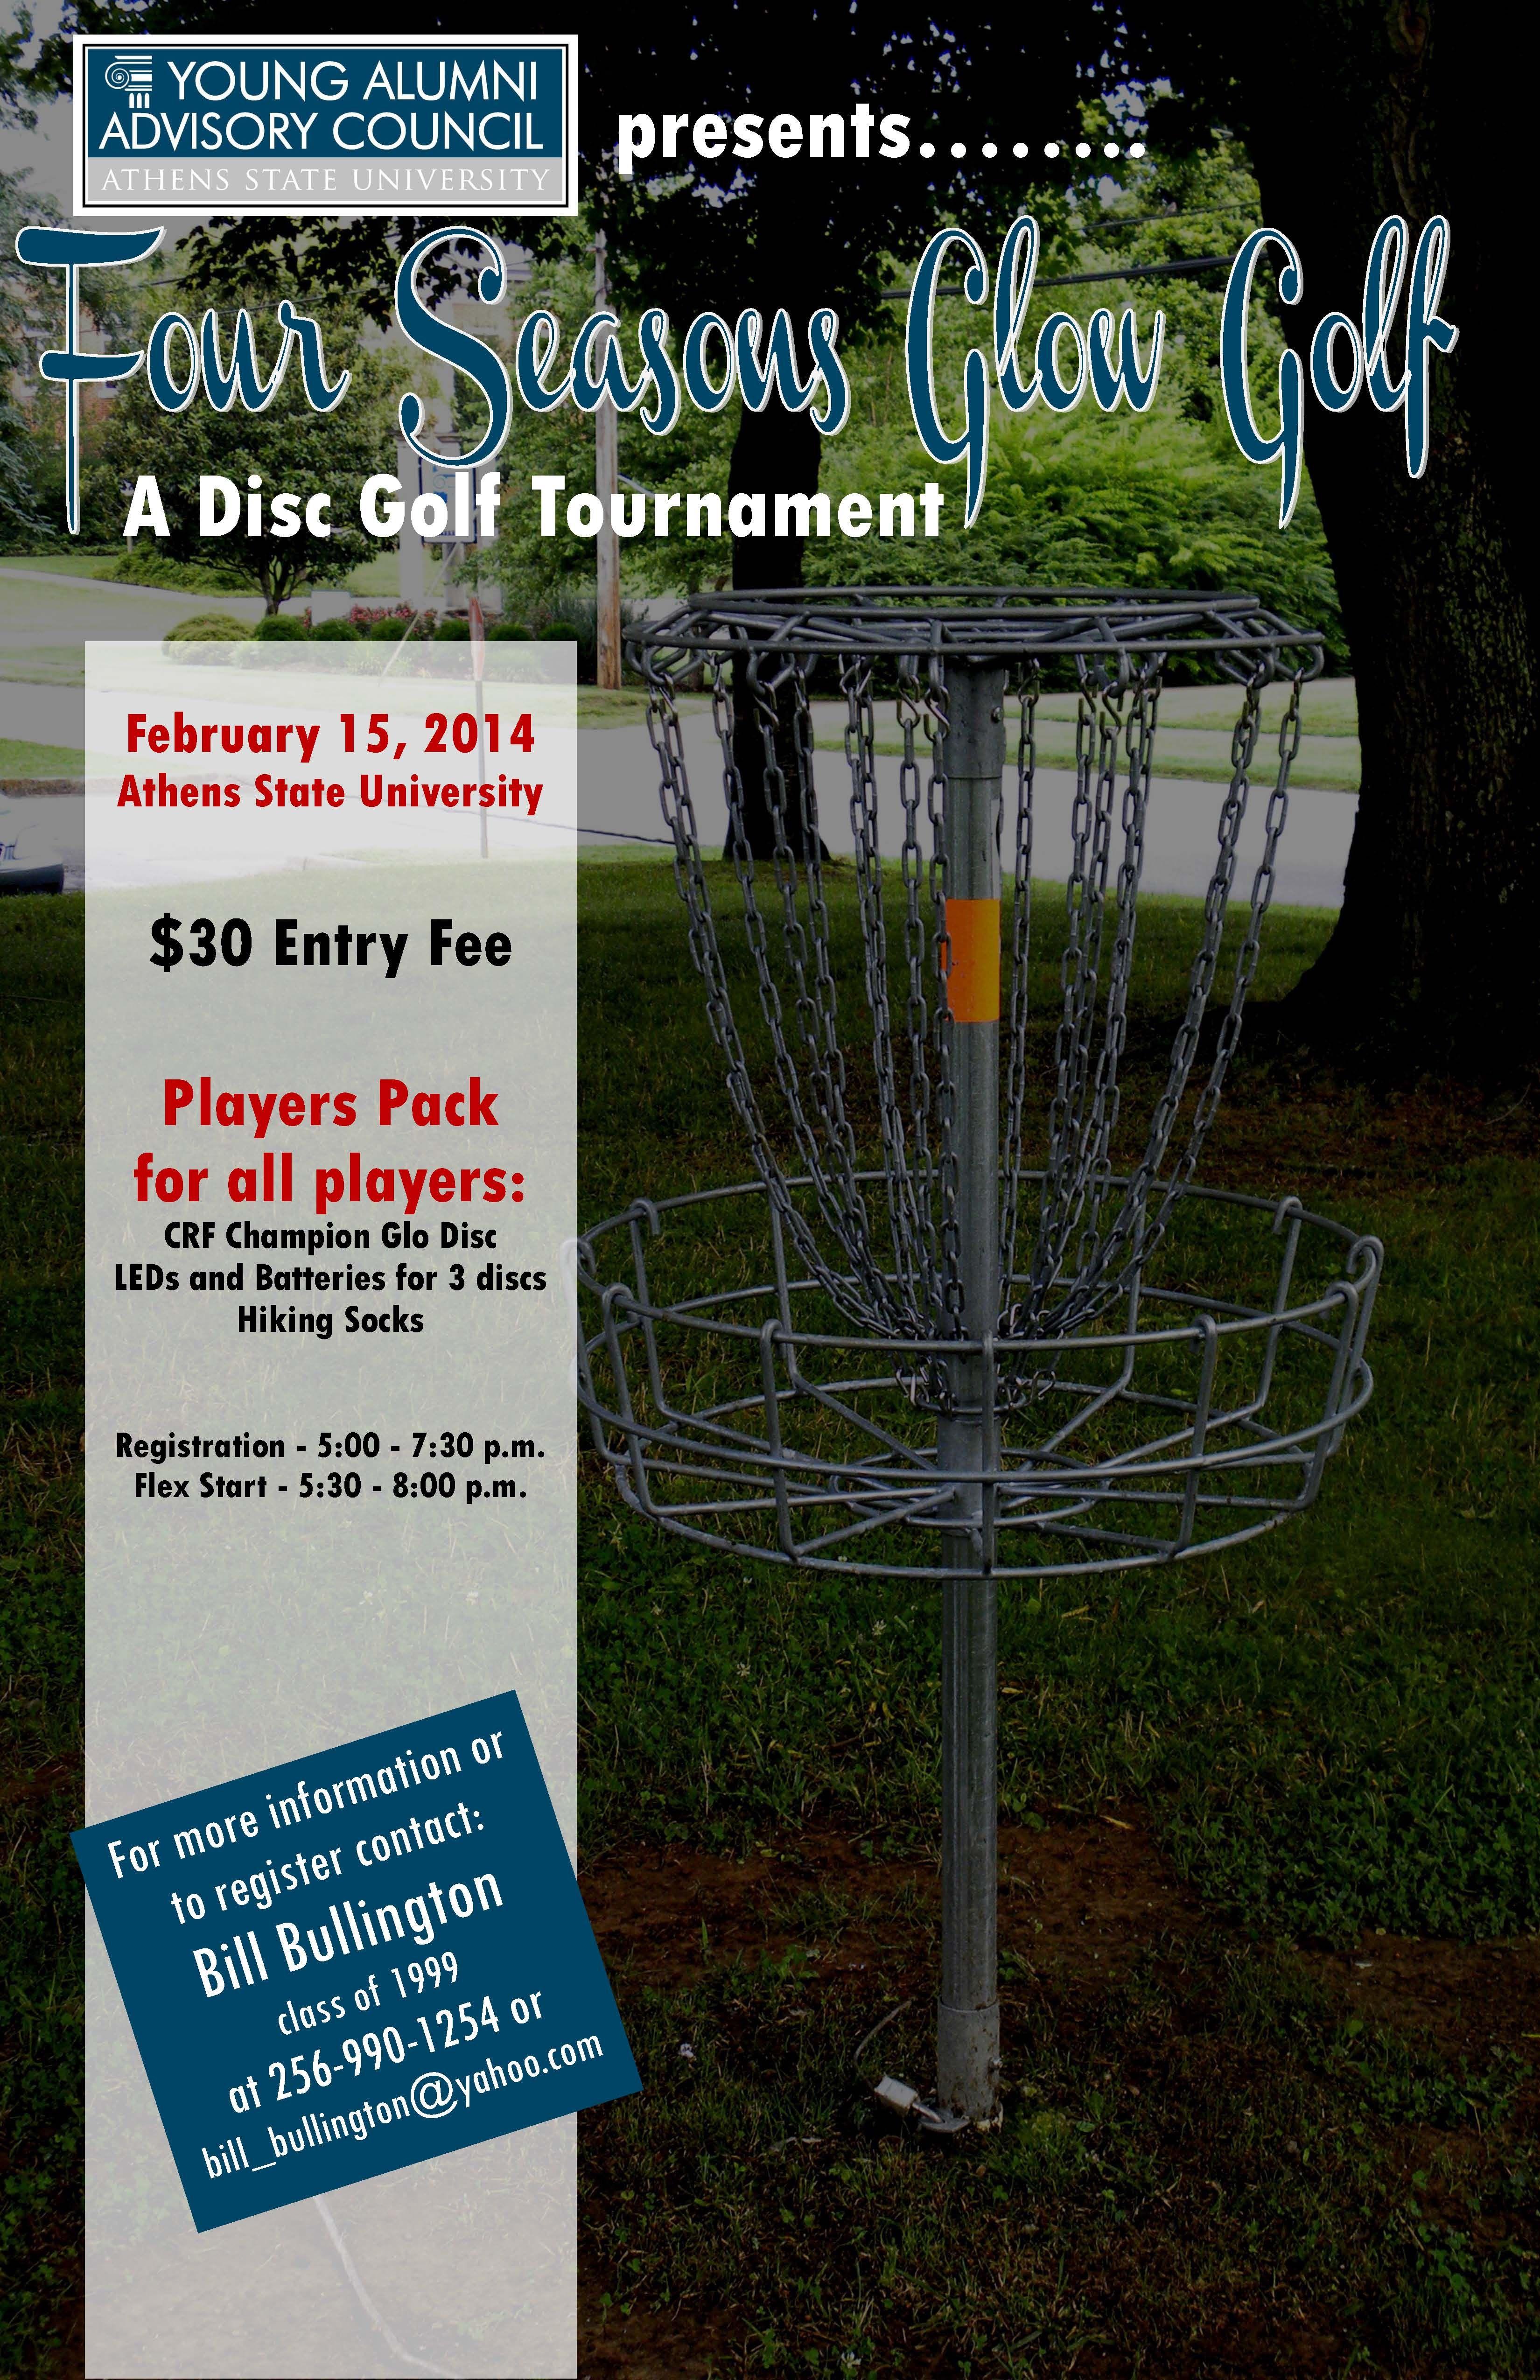 Glow golf february 15 golf tournament disc golf